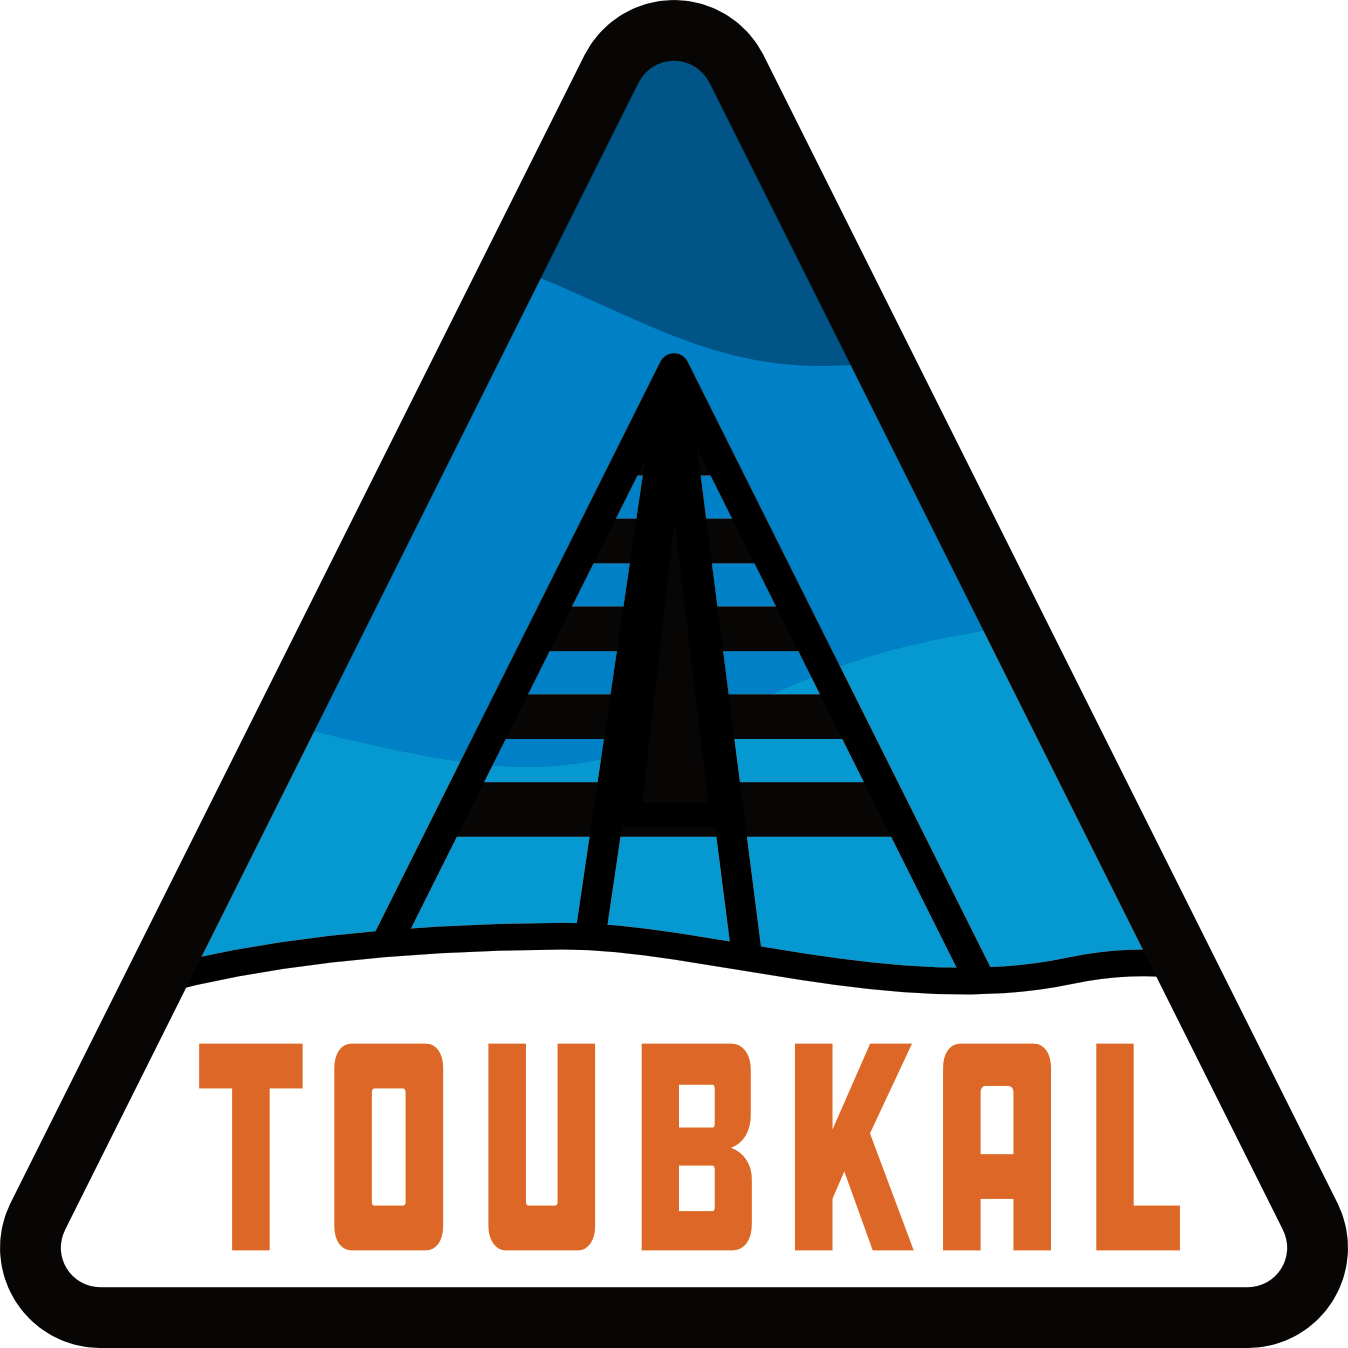 Toubkal_Namaste_Patch_PNG.png